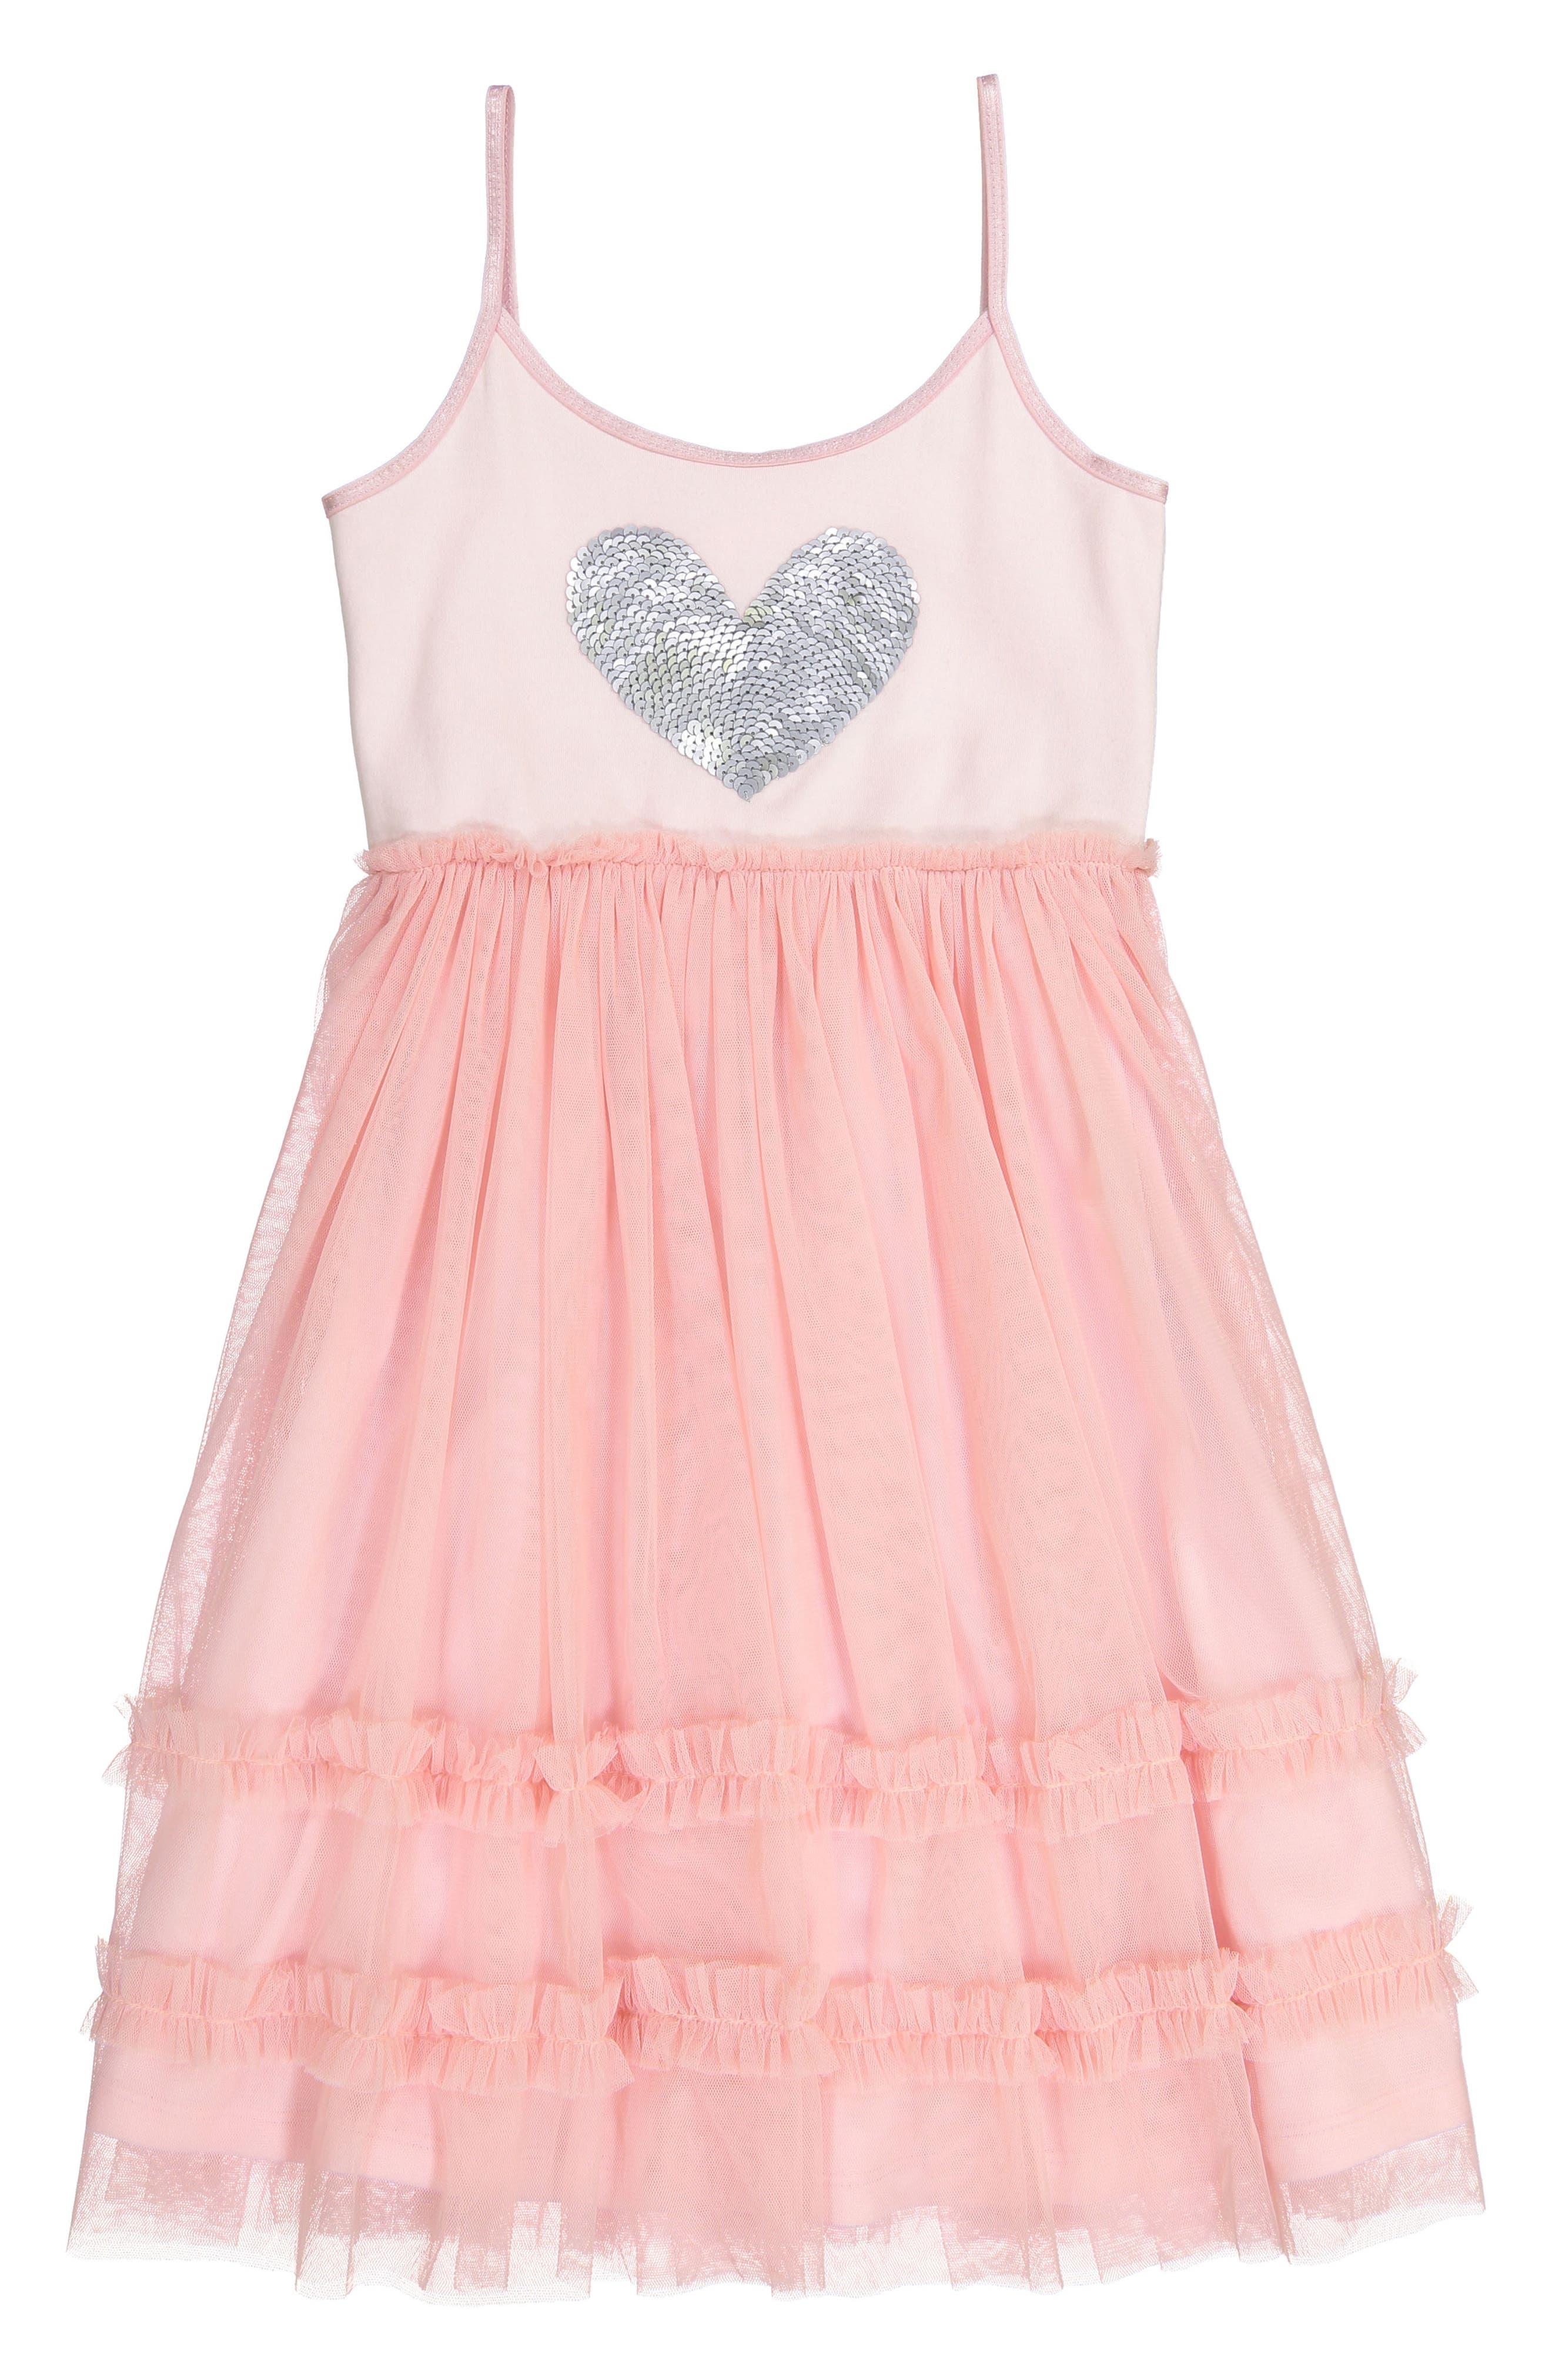 Main Image - Masala Baby Sequin Heart Dress with Tulle Skirt (Toddler Girls, Little Girls & Big Girls)